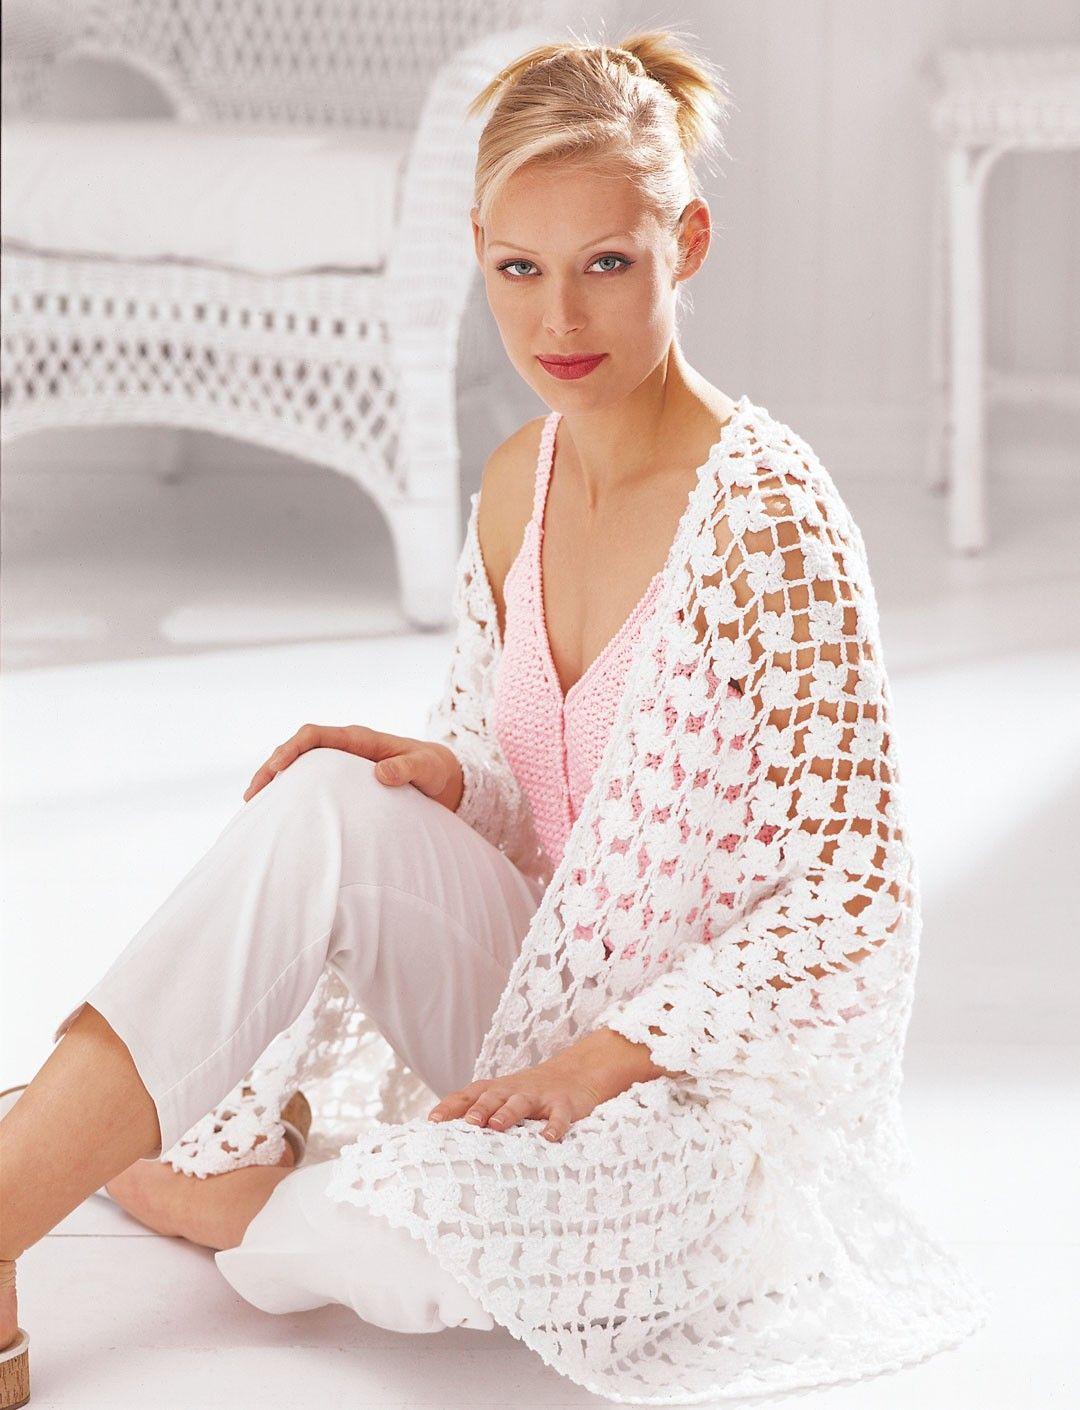 Yarnspirations.com - Patons Floral Shawl - Patterns | Yarnspirations ...